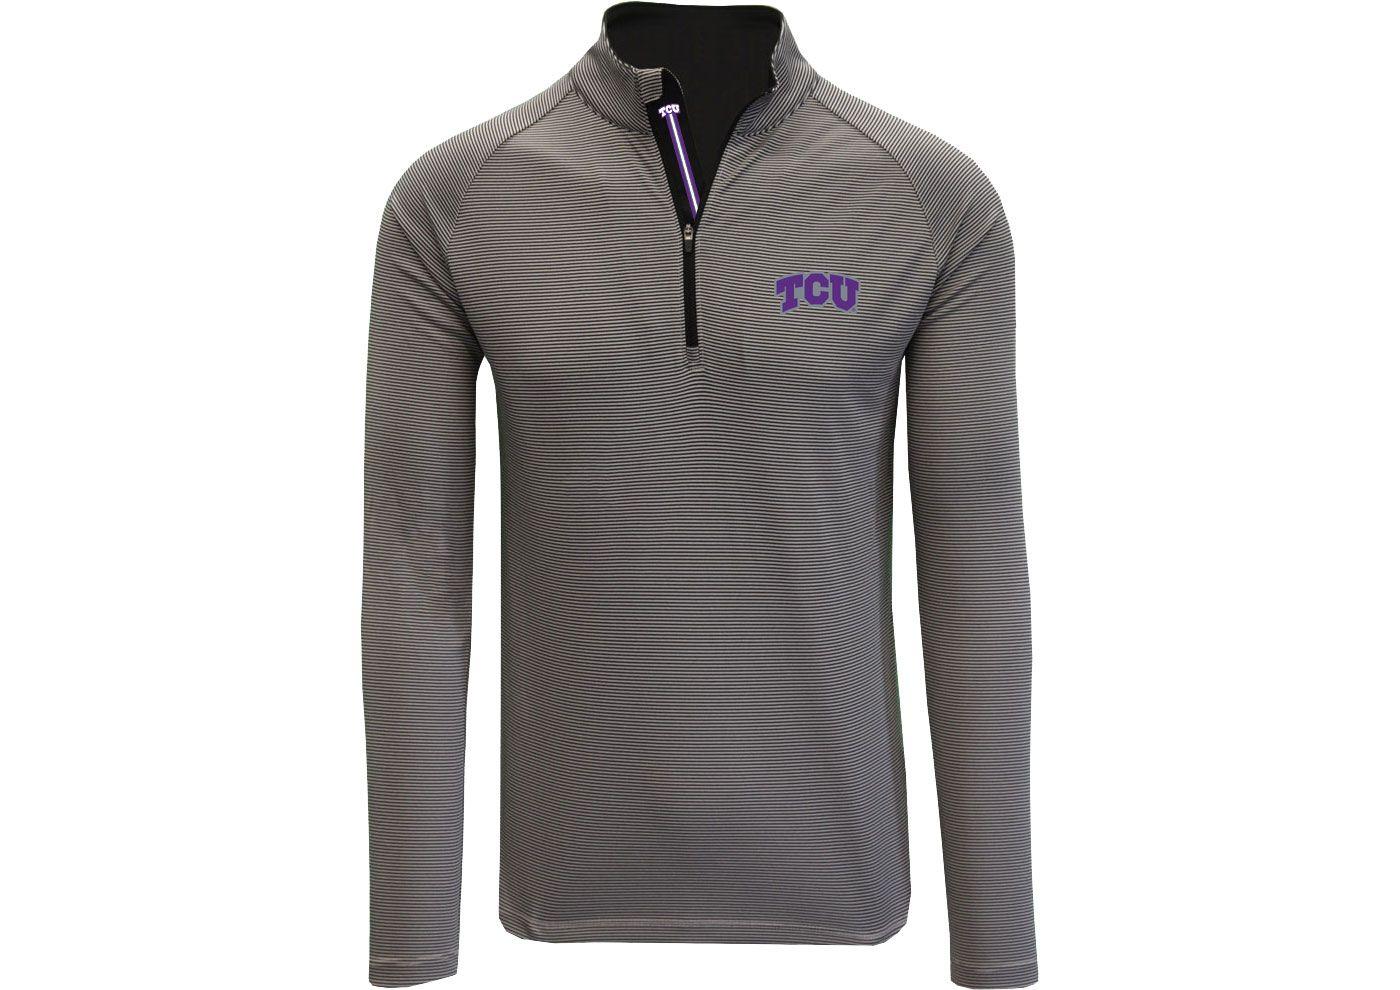 Levelwear Men's TCU Horned Frogs Grey Orion Quarter-Zip Shirt